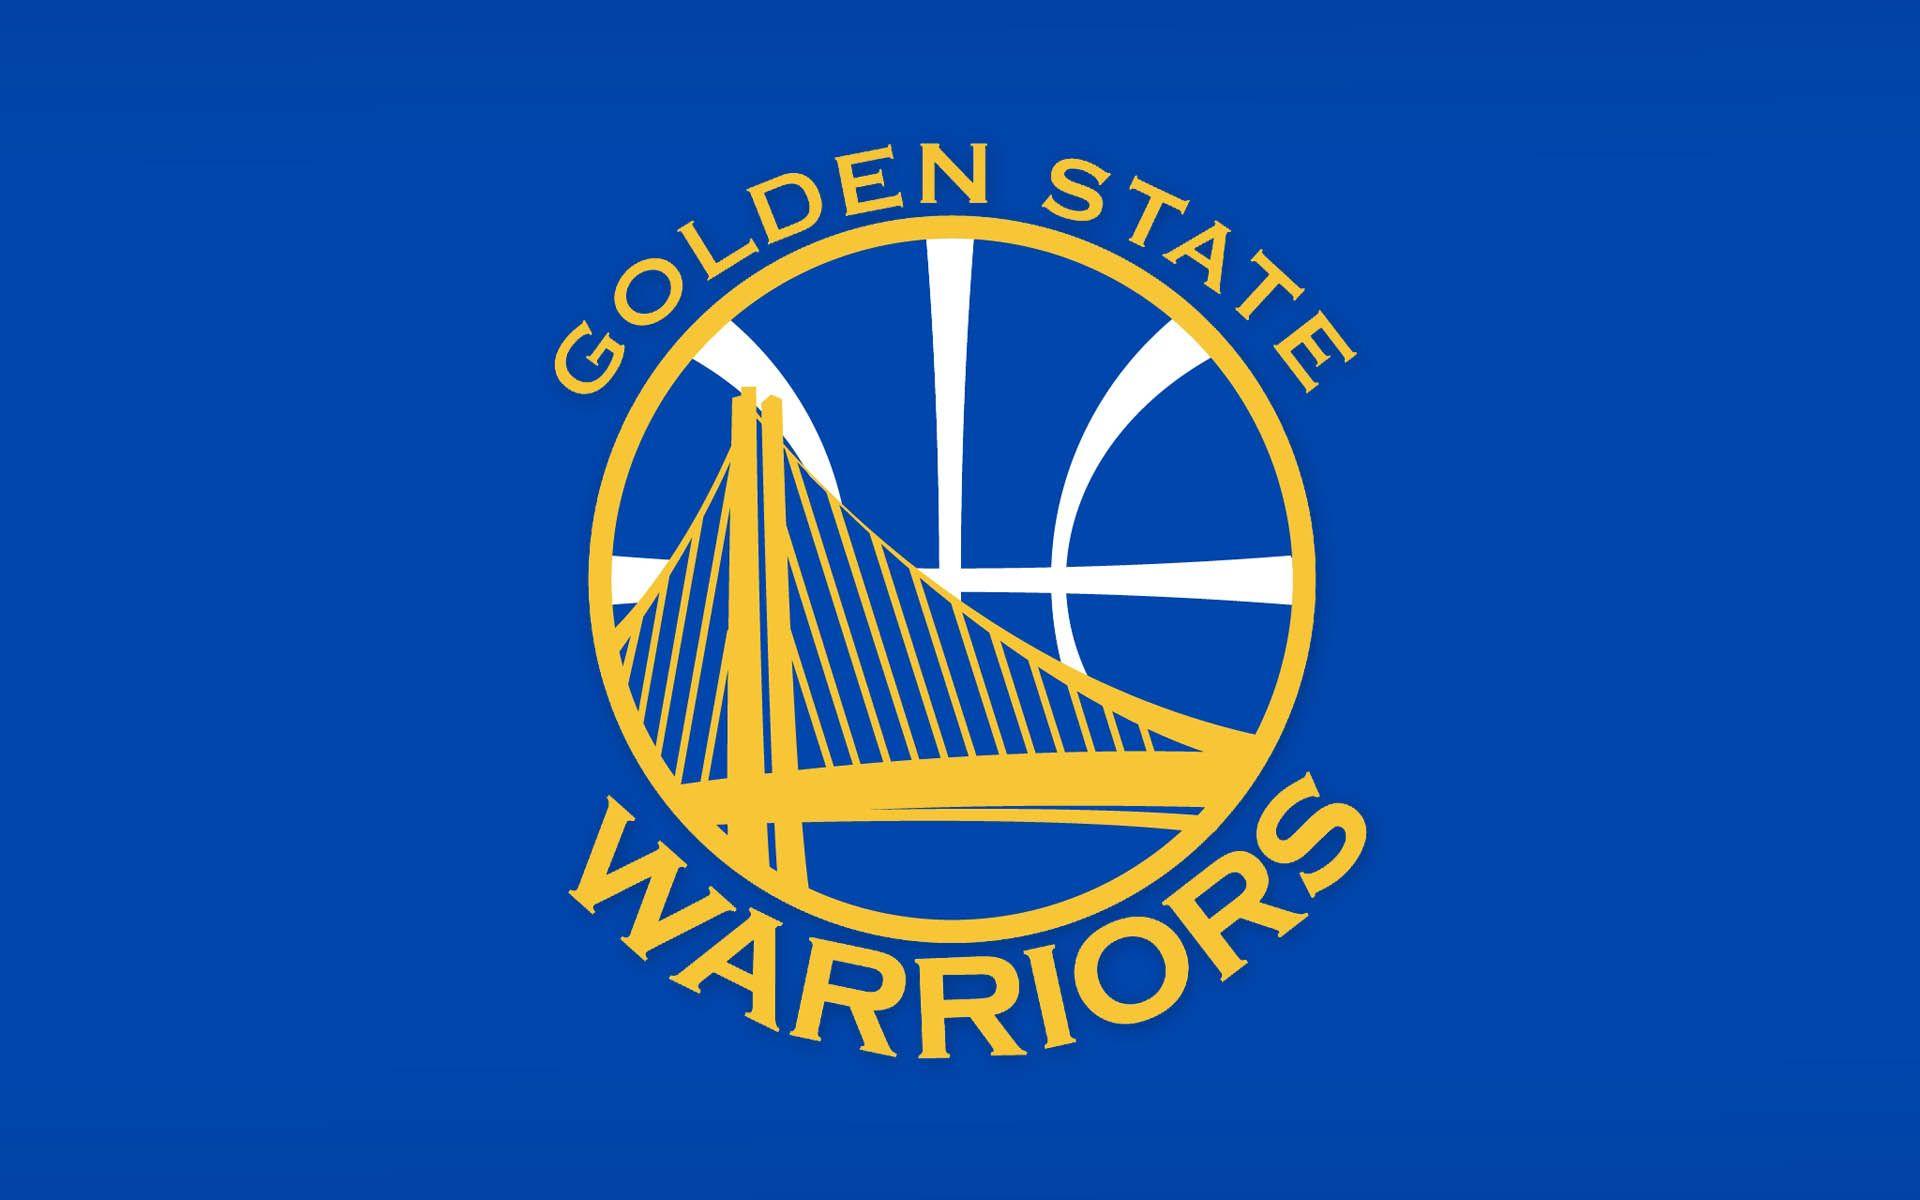 Golden State Warriors Wallpapers.